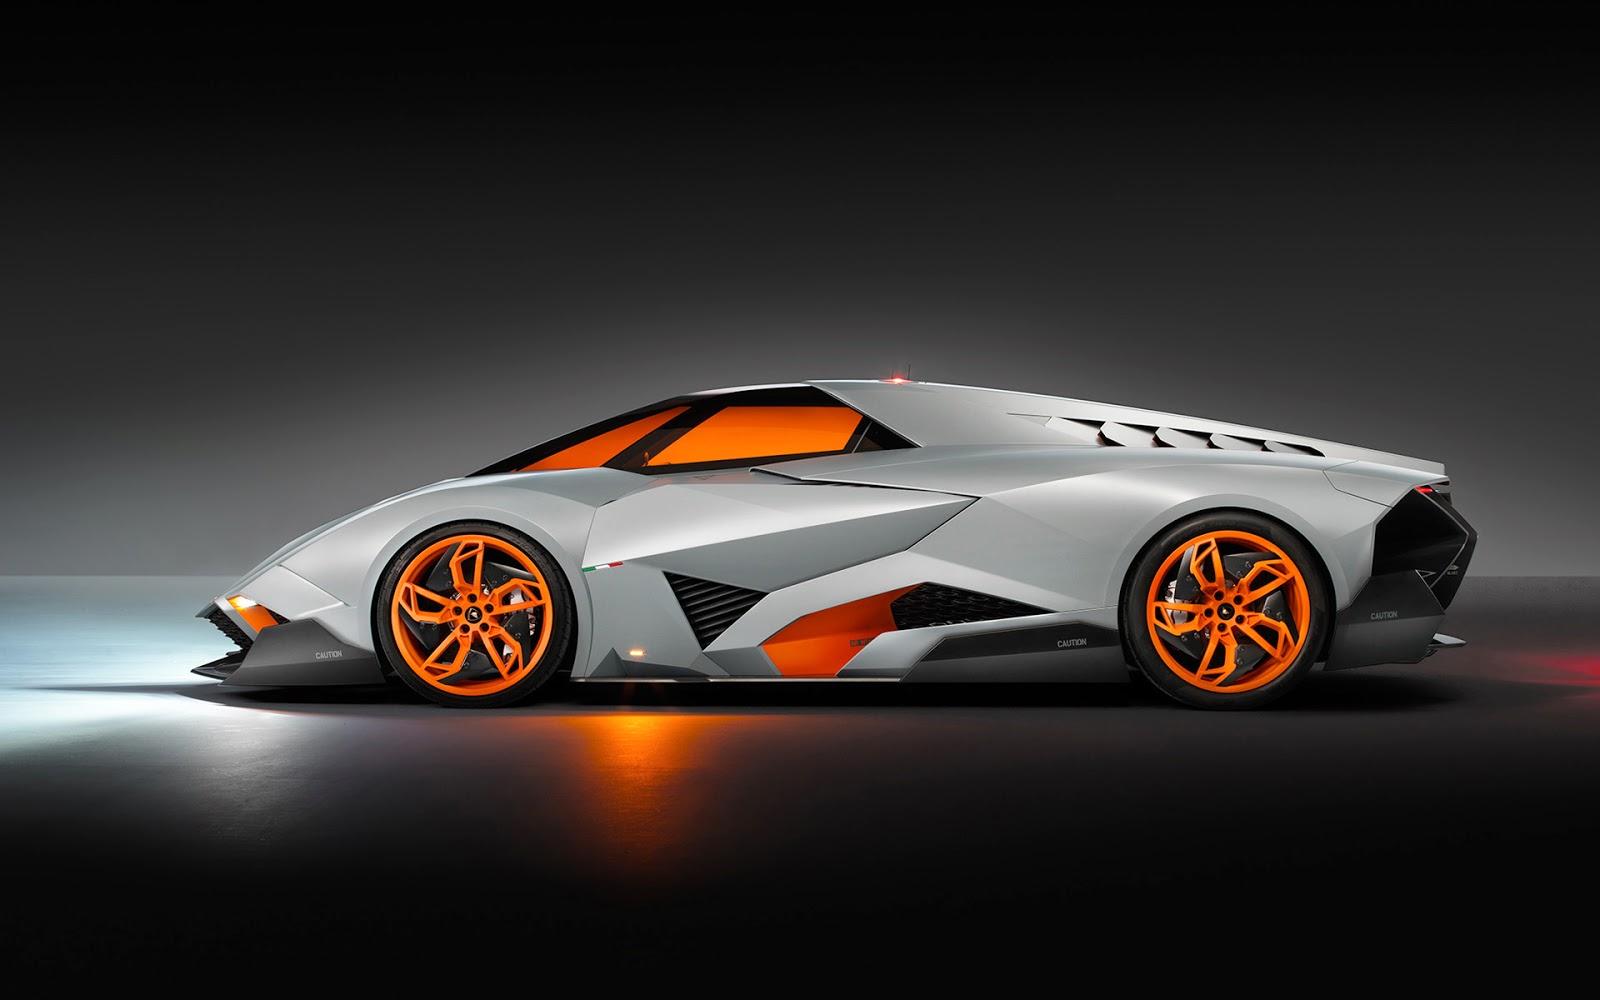 Allinallwalls Car Wallpapers 2014 Iphone Car Fast Cool Cars